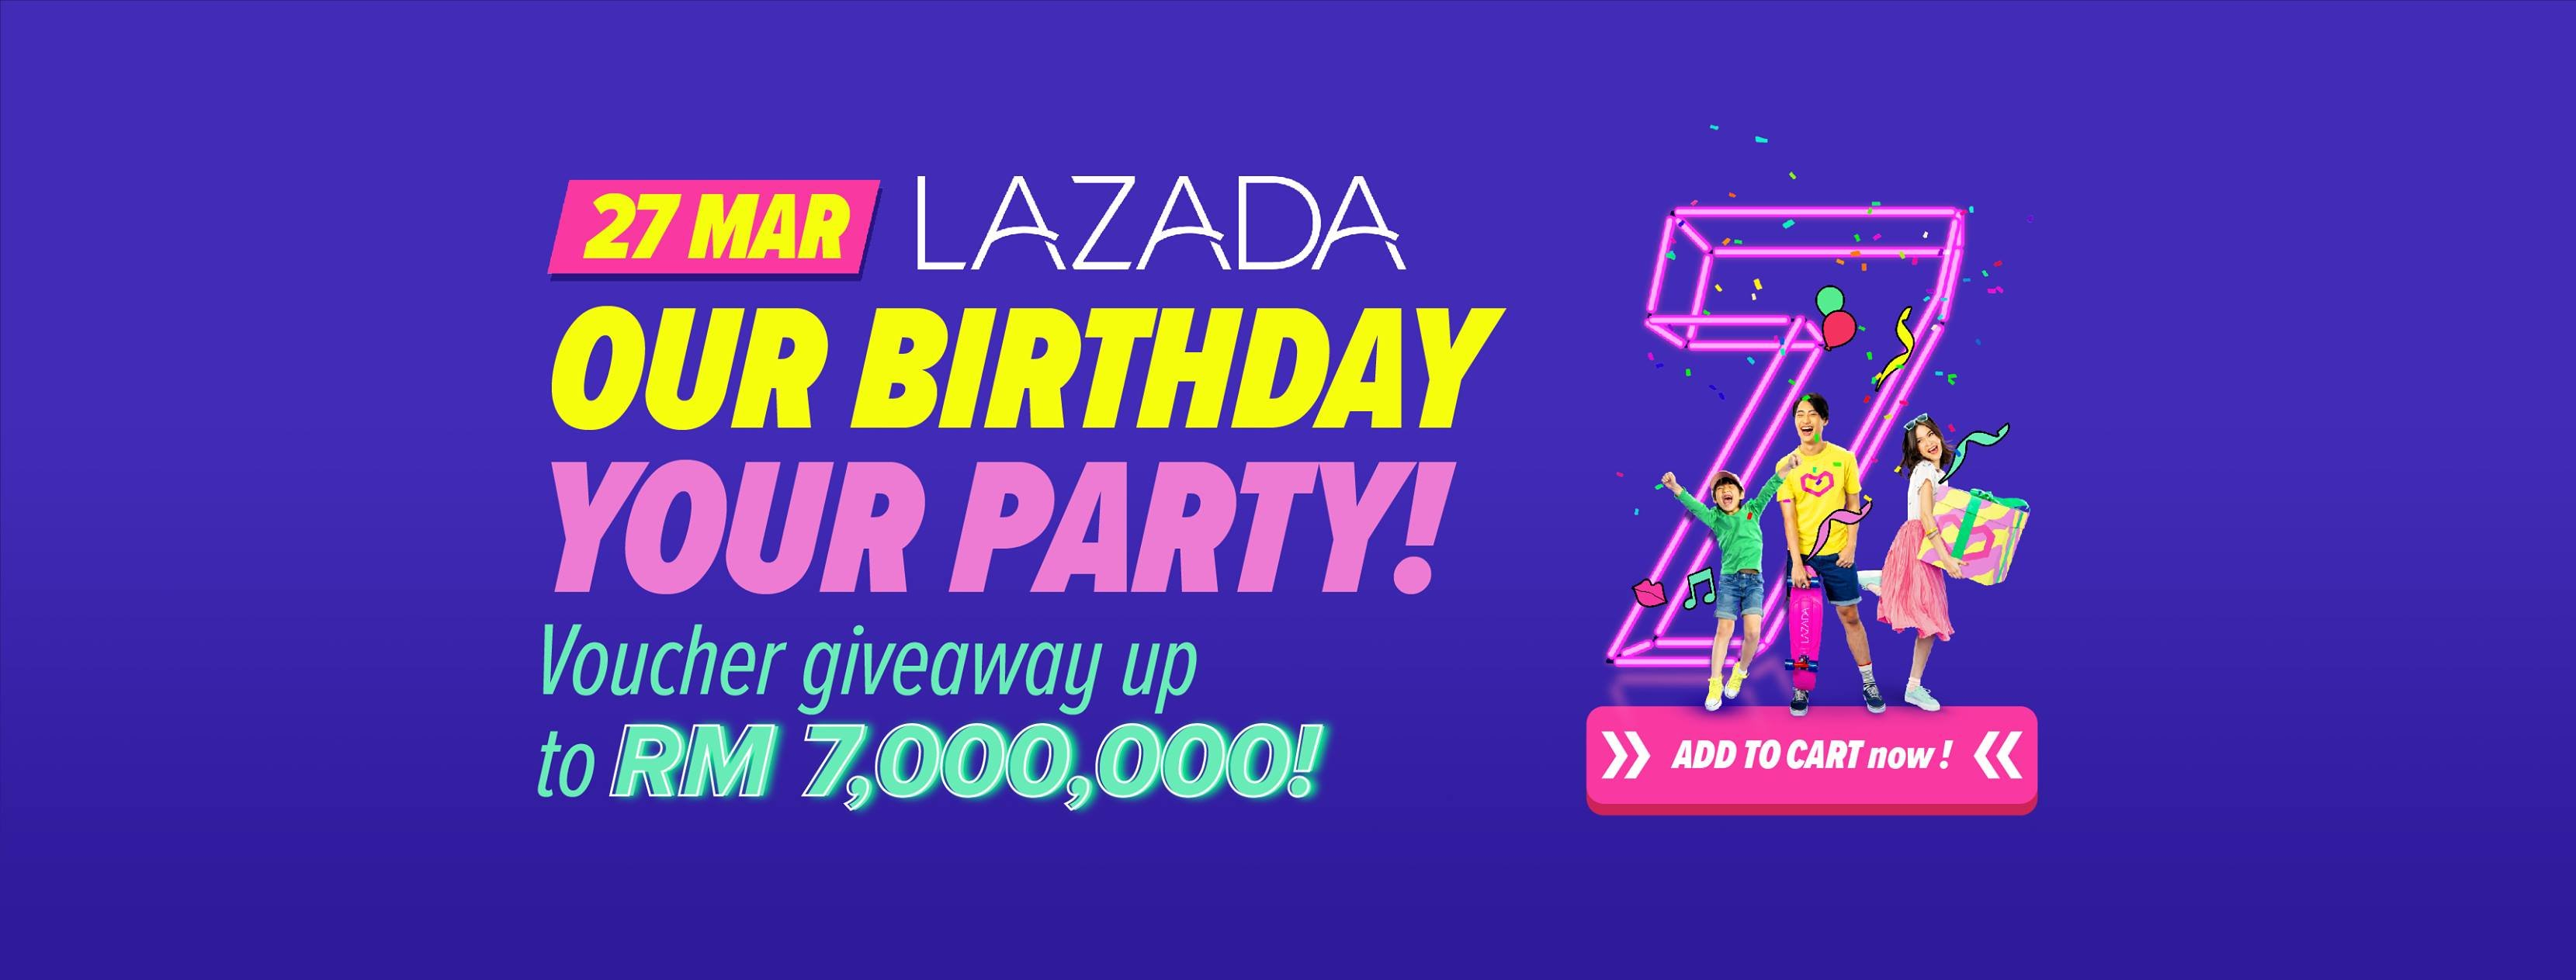 Lazada Anniversary Sale 2019 – Coupon Malaysia, Malaysia Sales Calendar 2019 Lazada